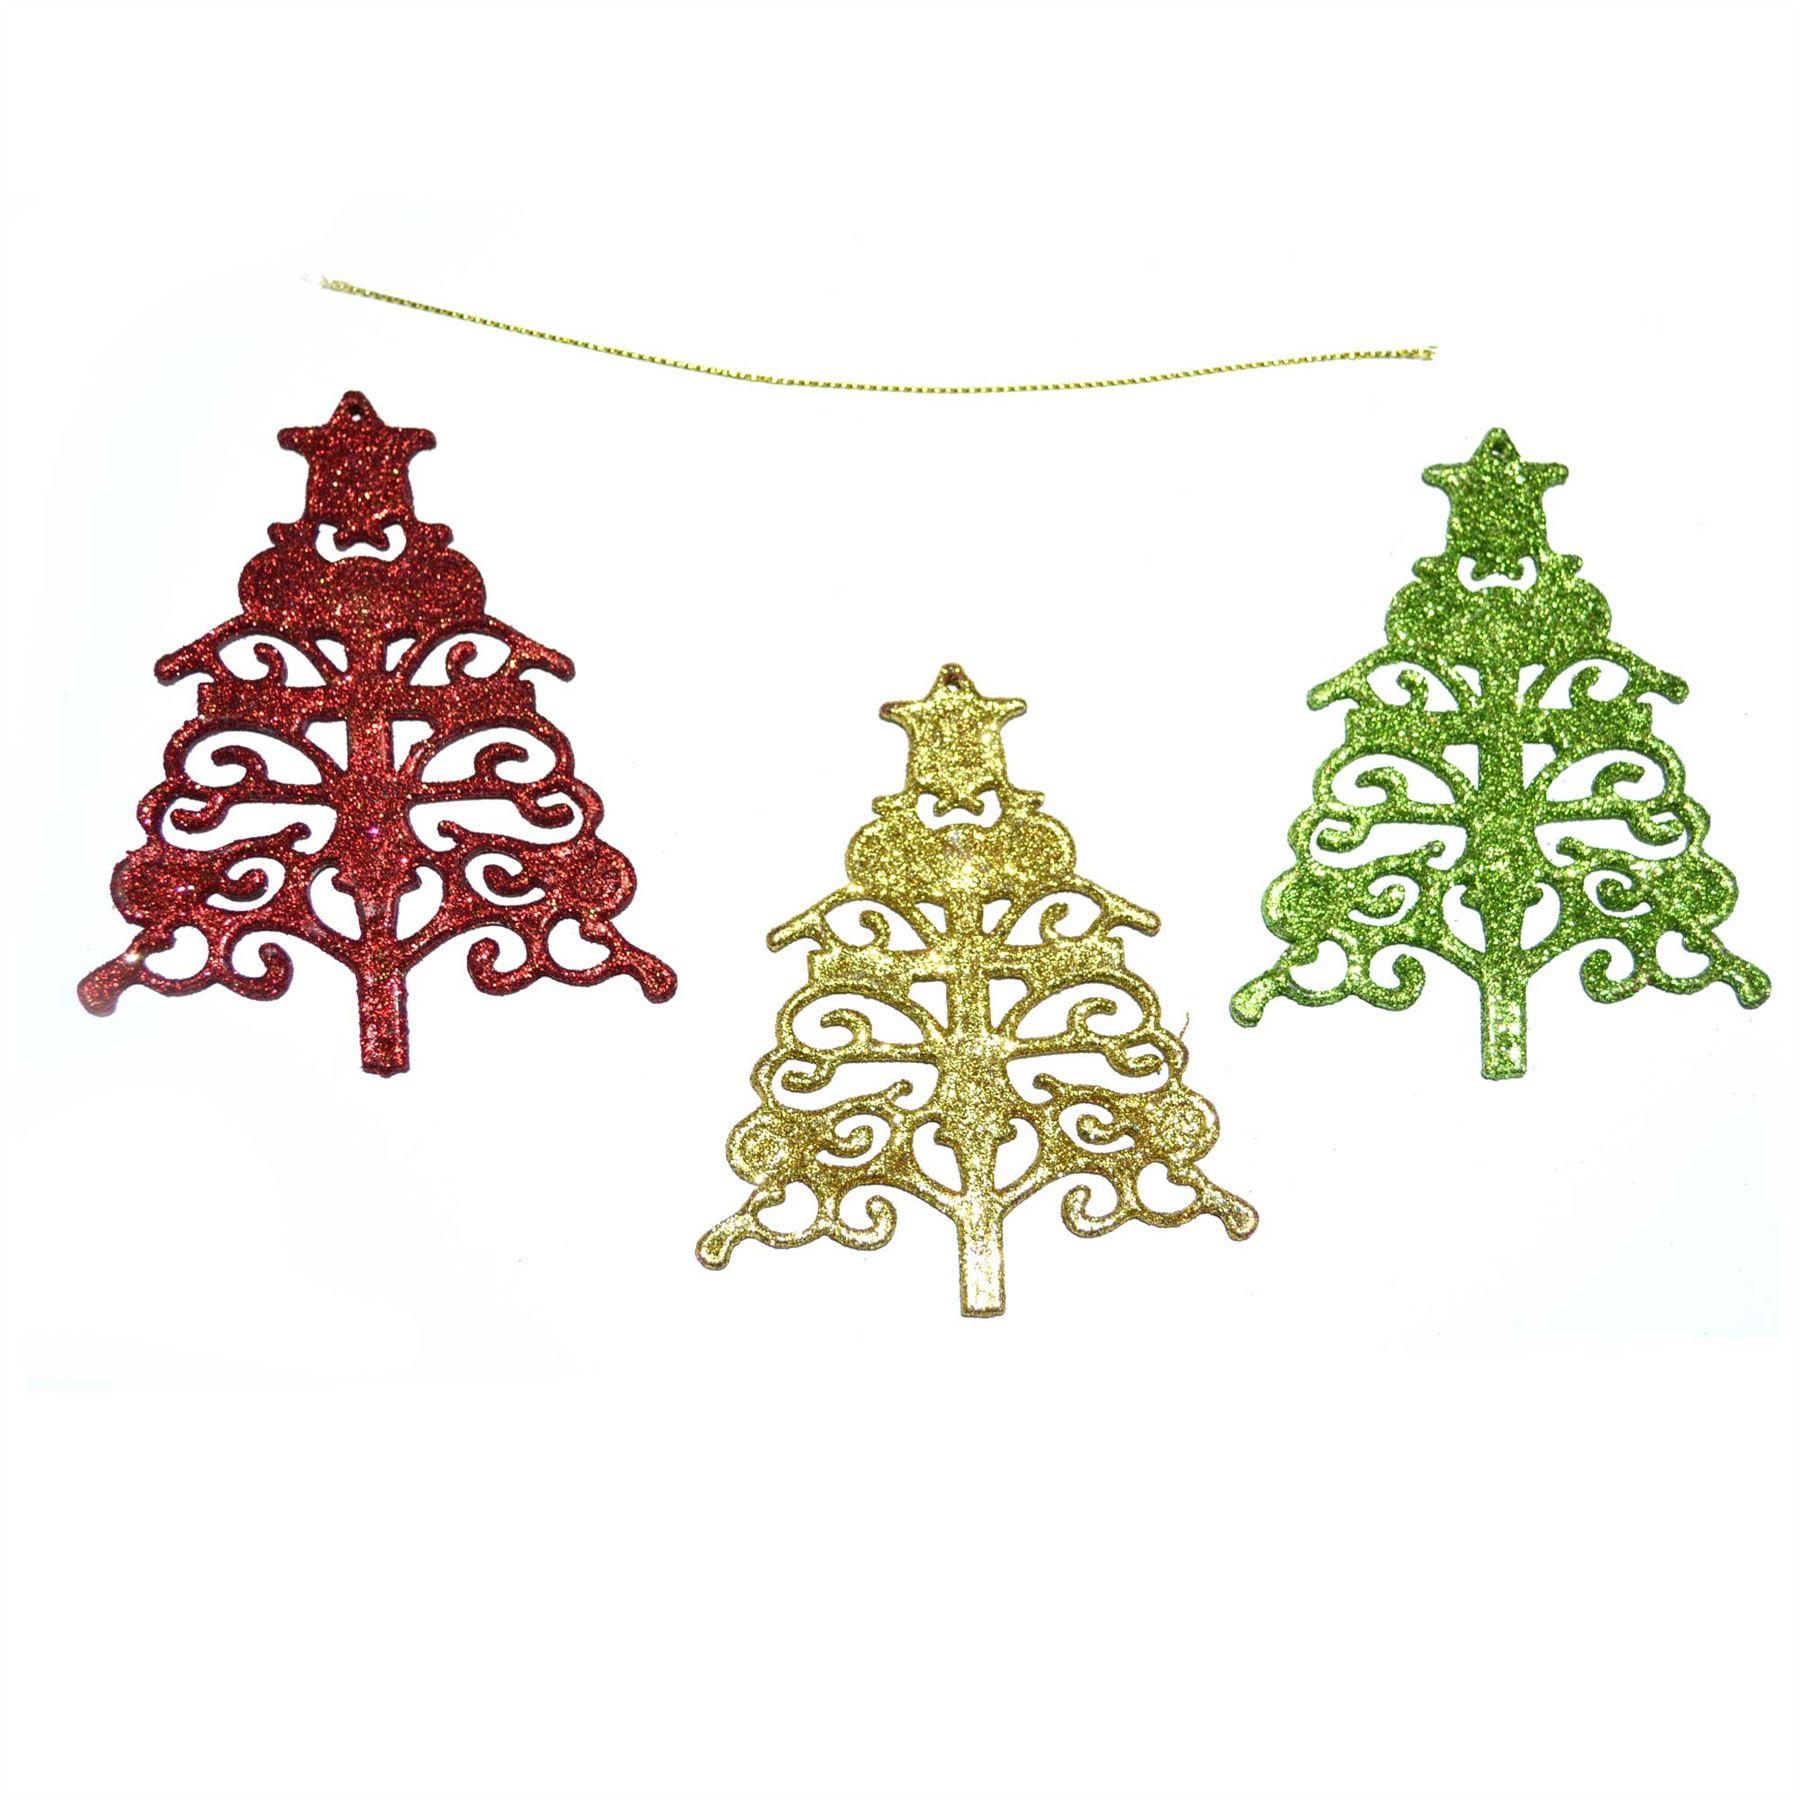 Christmas-Tree-Hanging-Decorations-Glitter-Snowman-Xmas-Beads-Chain-Garland thumbnail 5